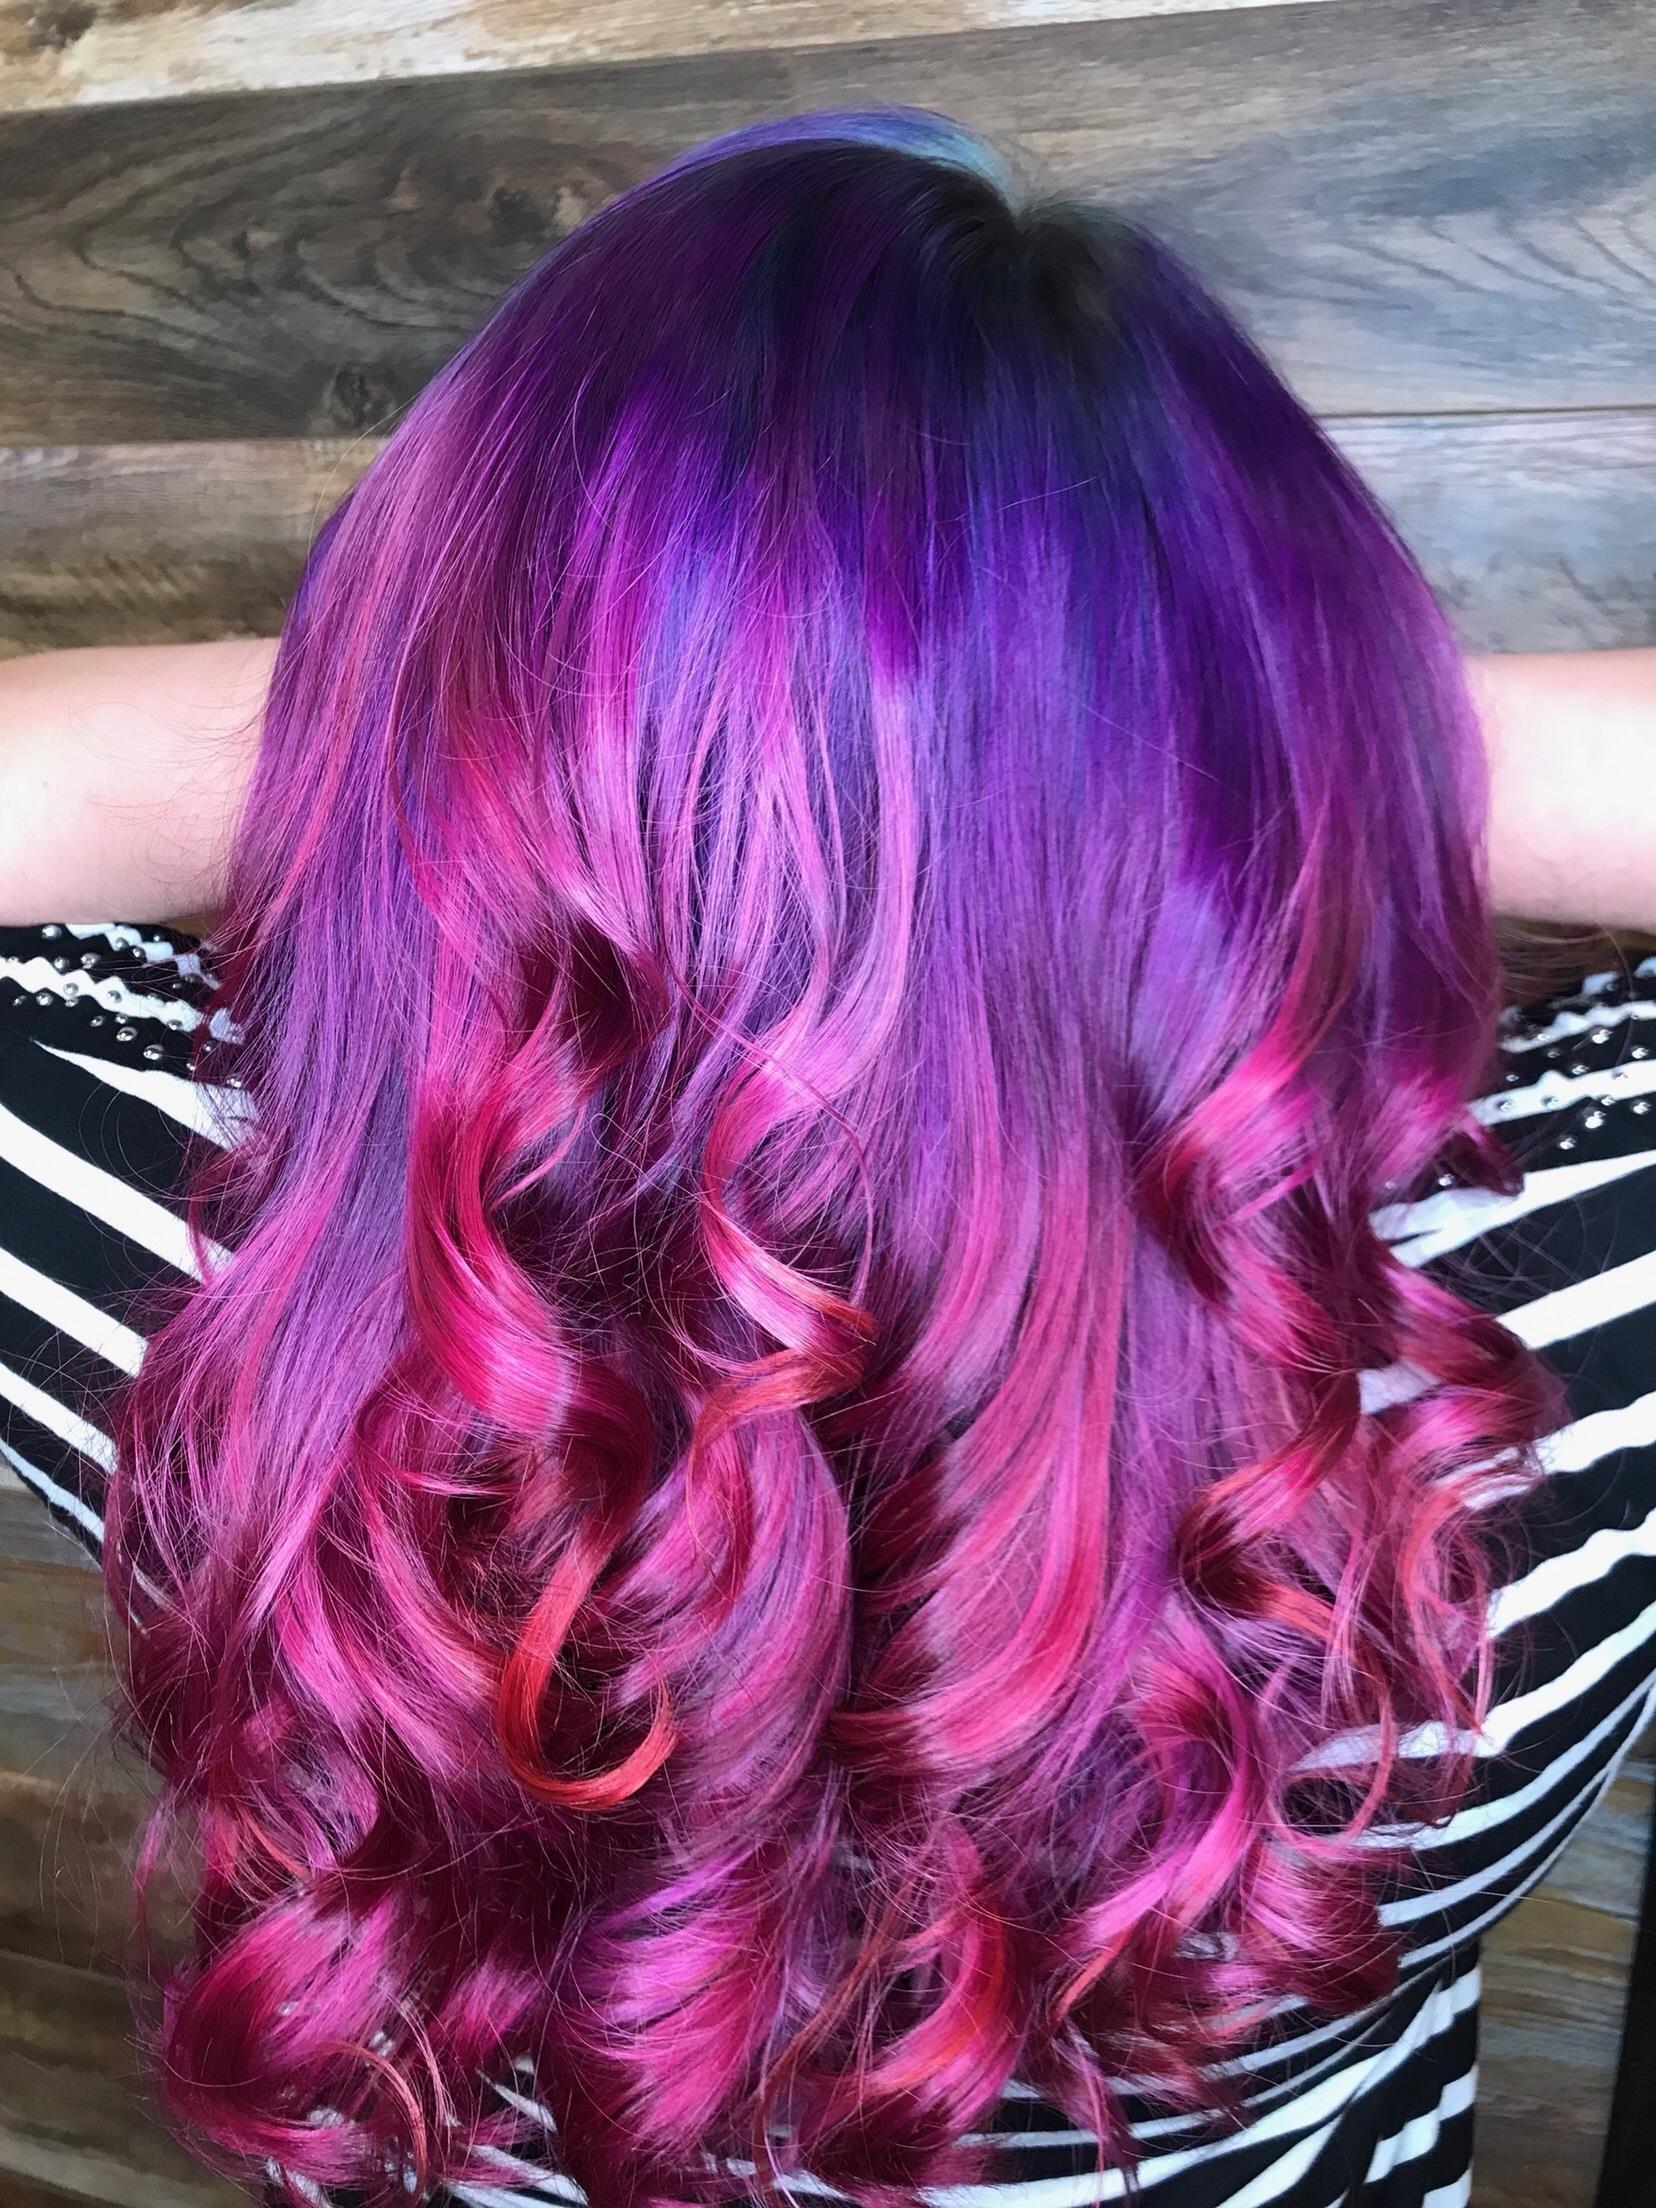 Hair creative color ideas rare photo